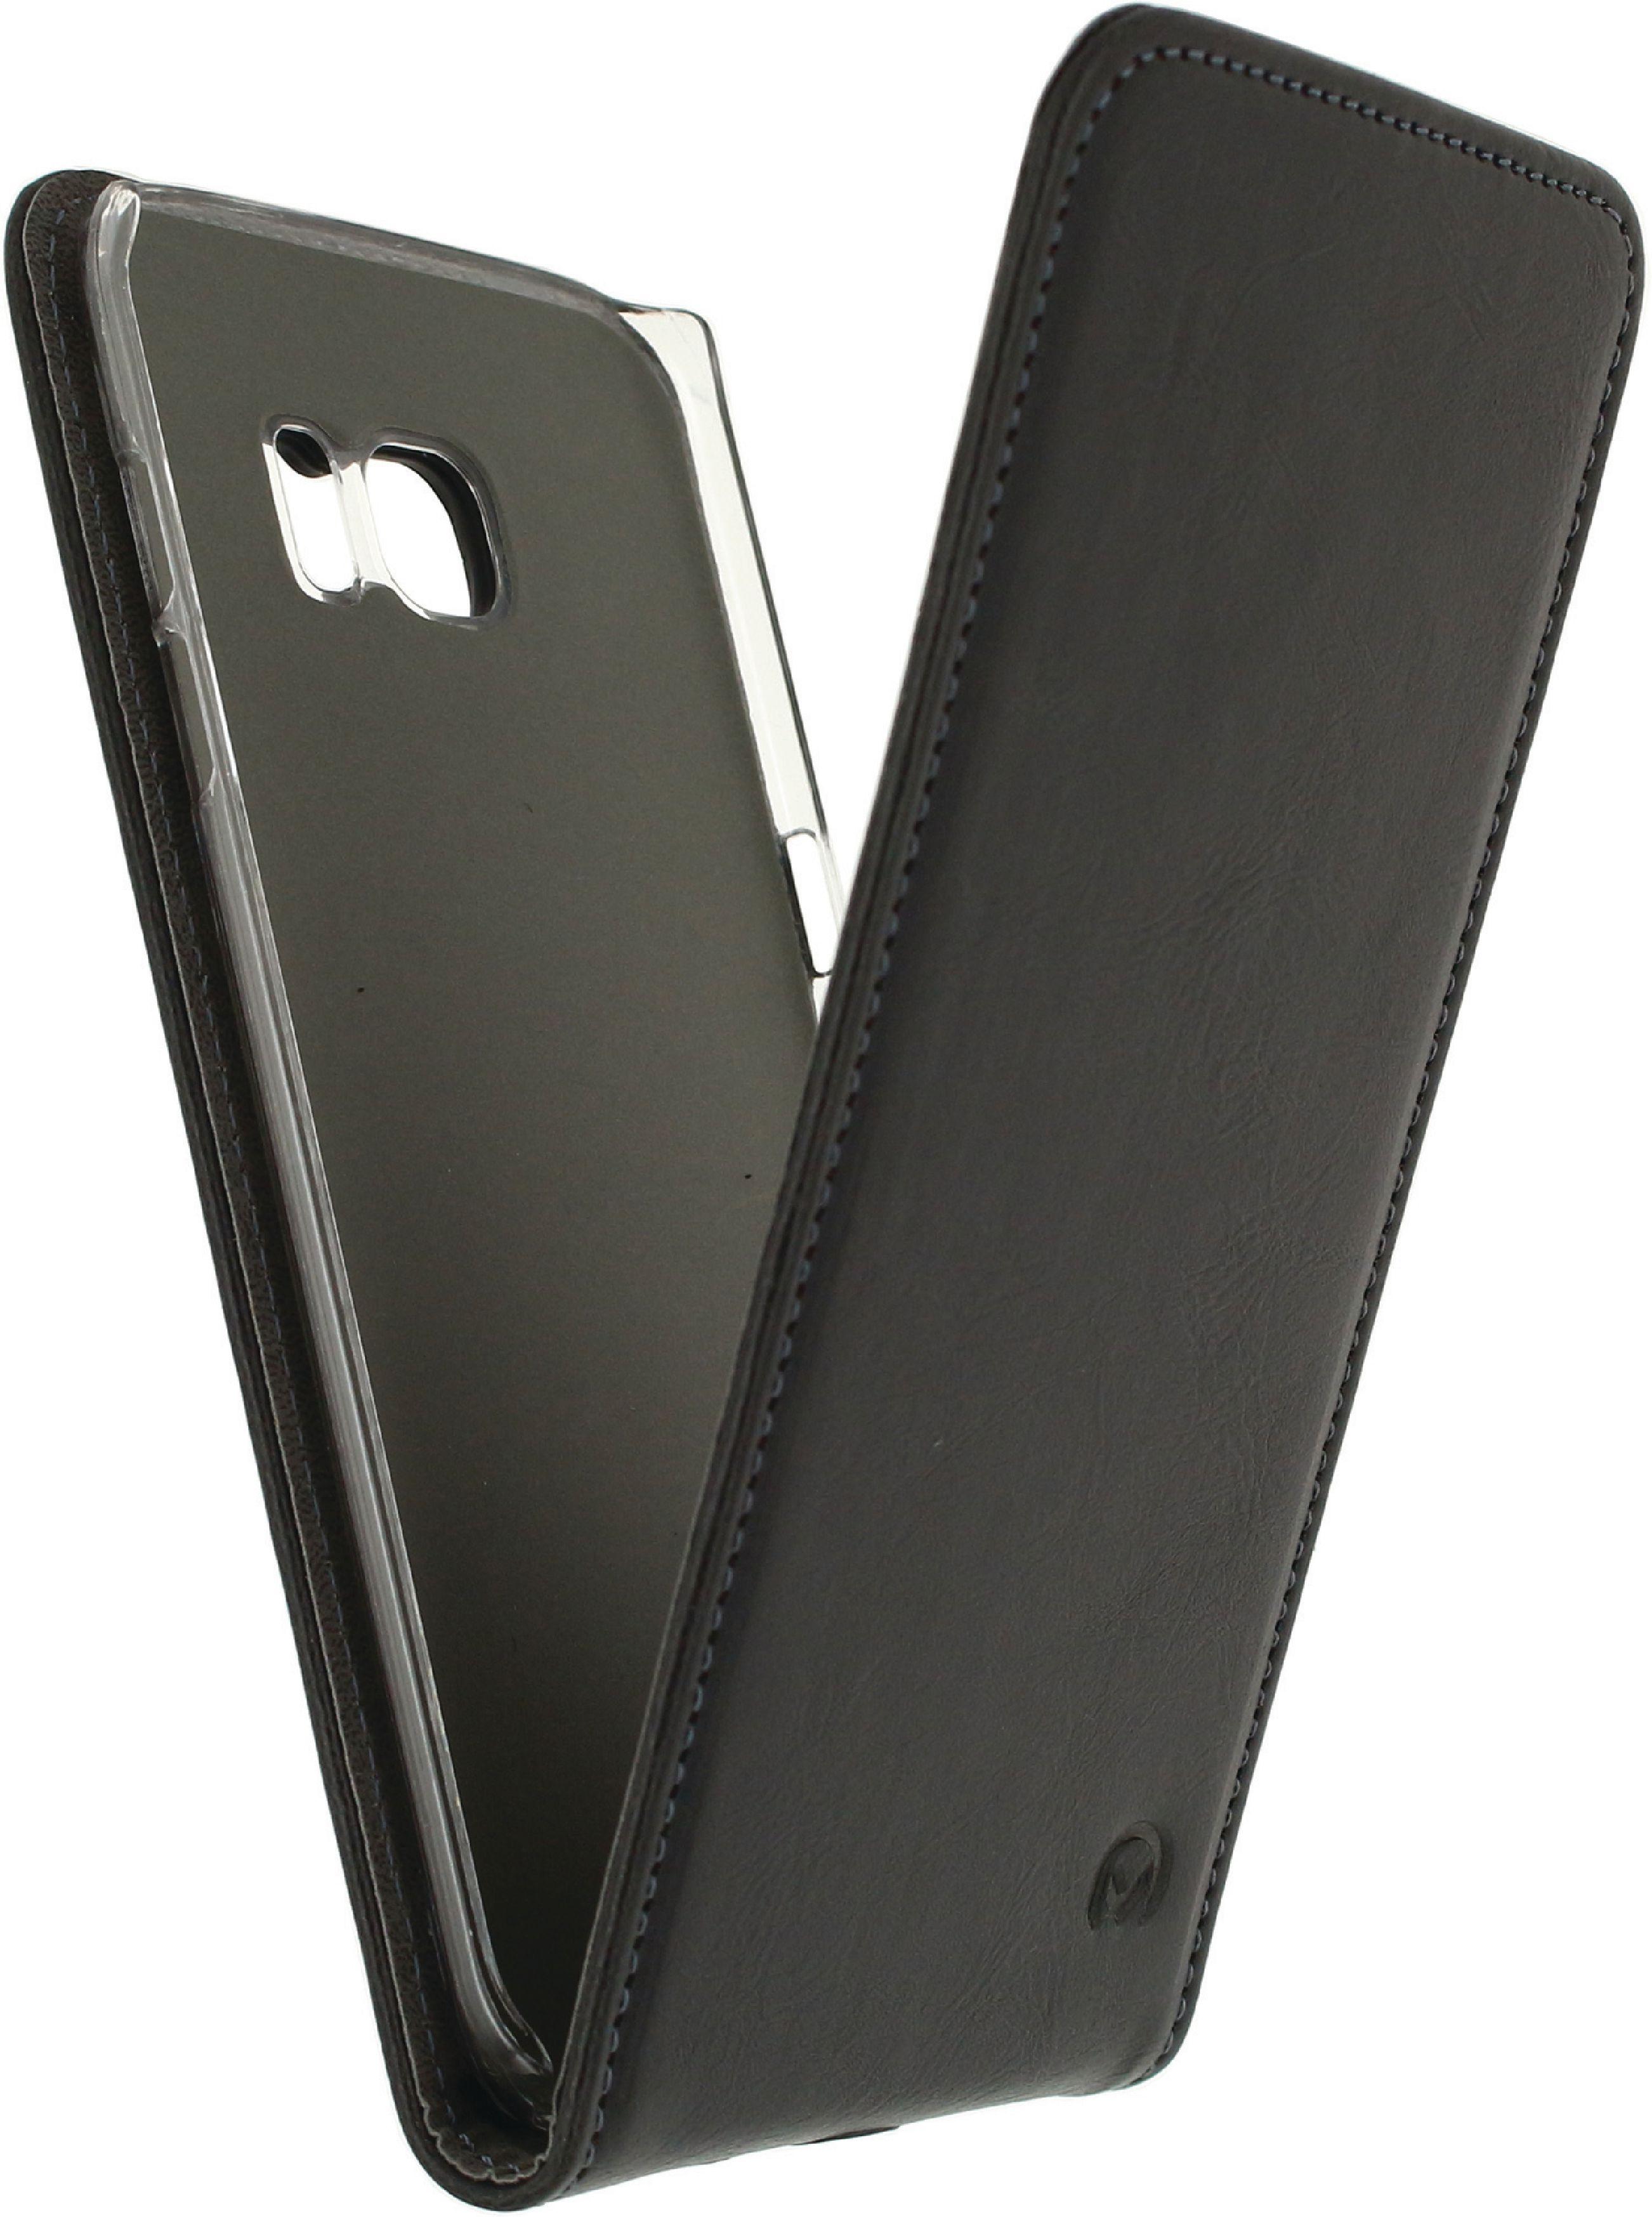 Image of   Telefon Premium Vippeetui med Magnet Samsung Galaxy S7 Edge Sort